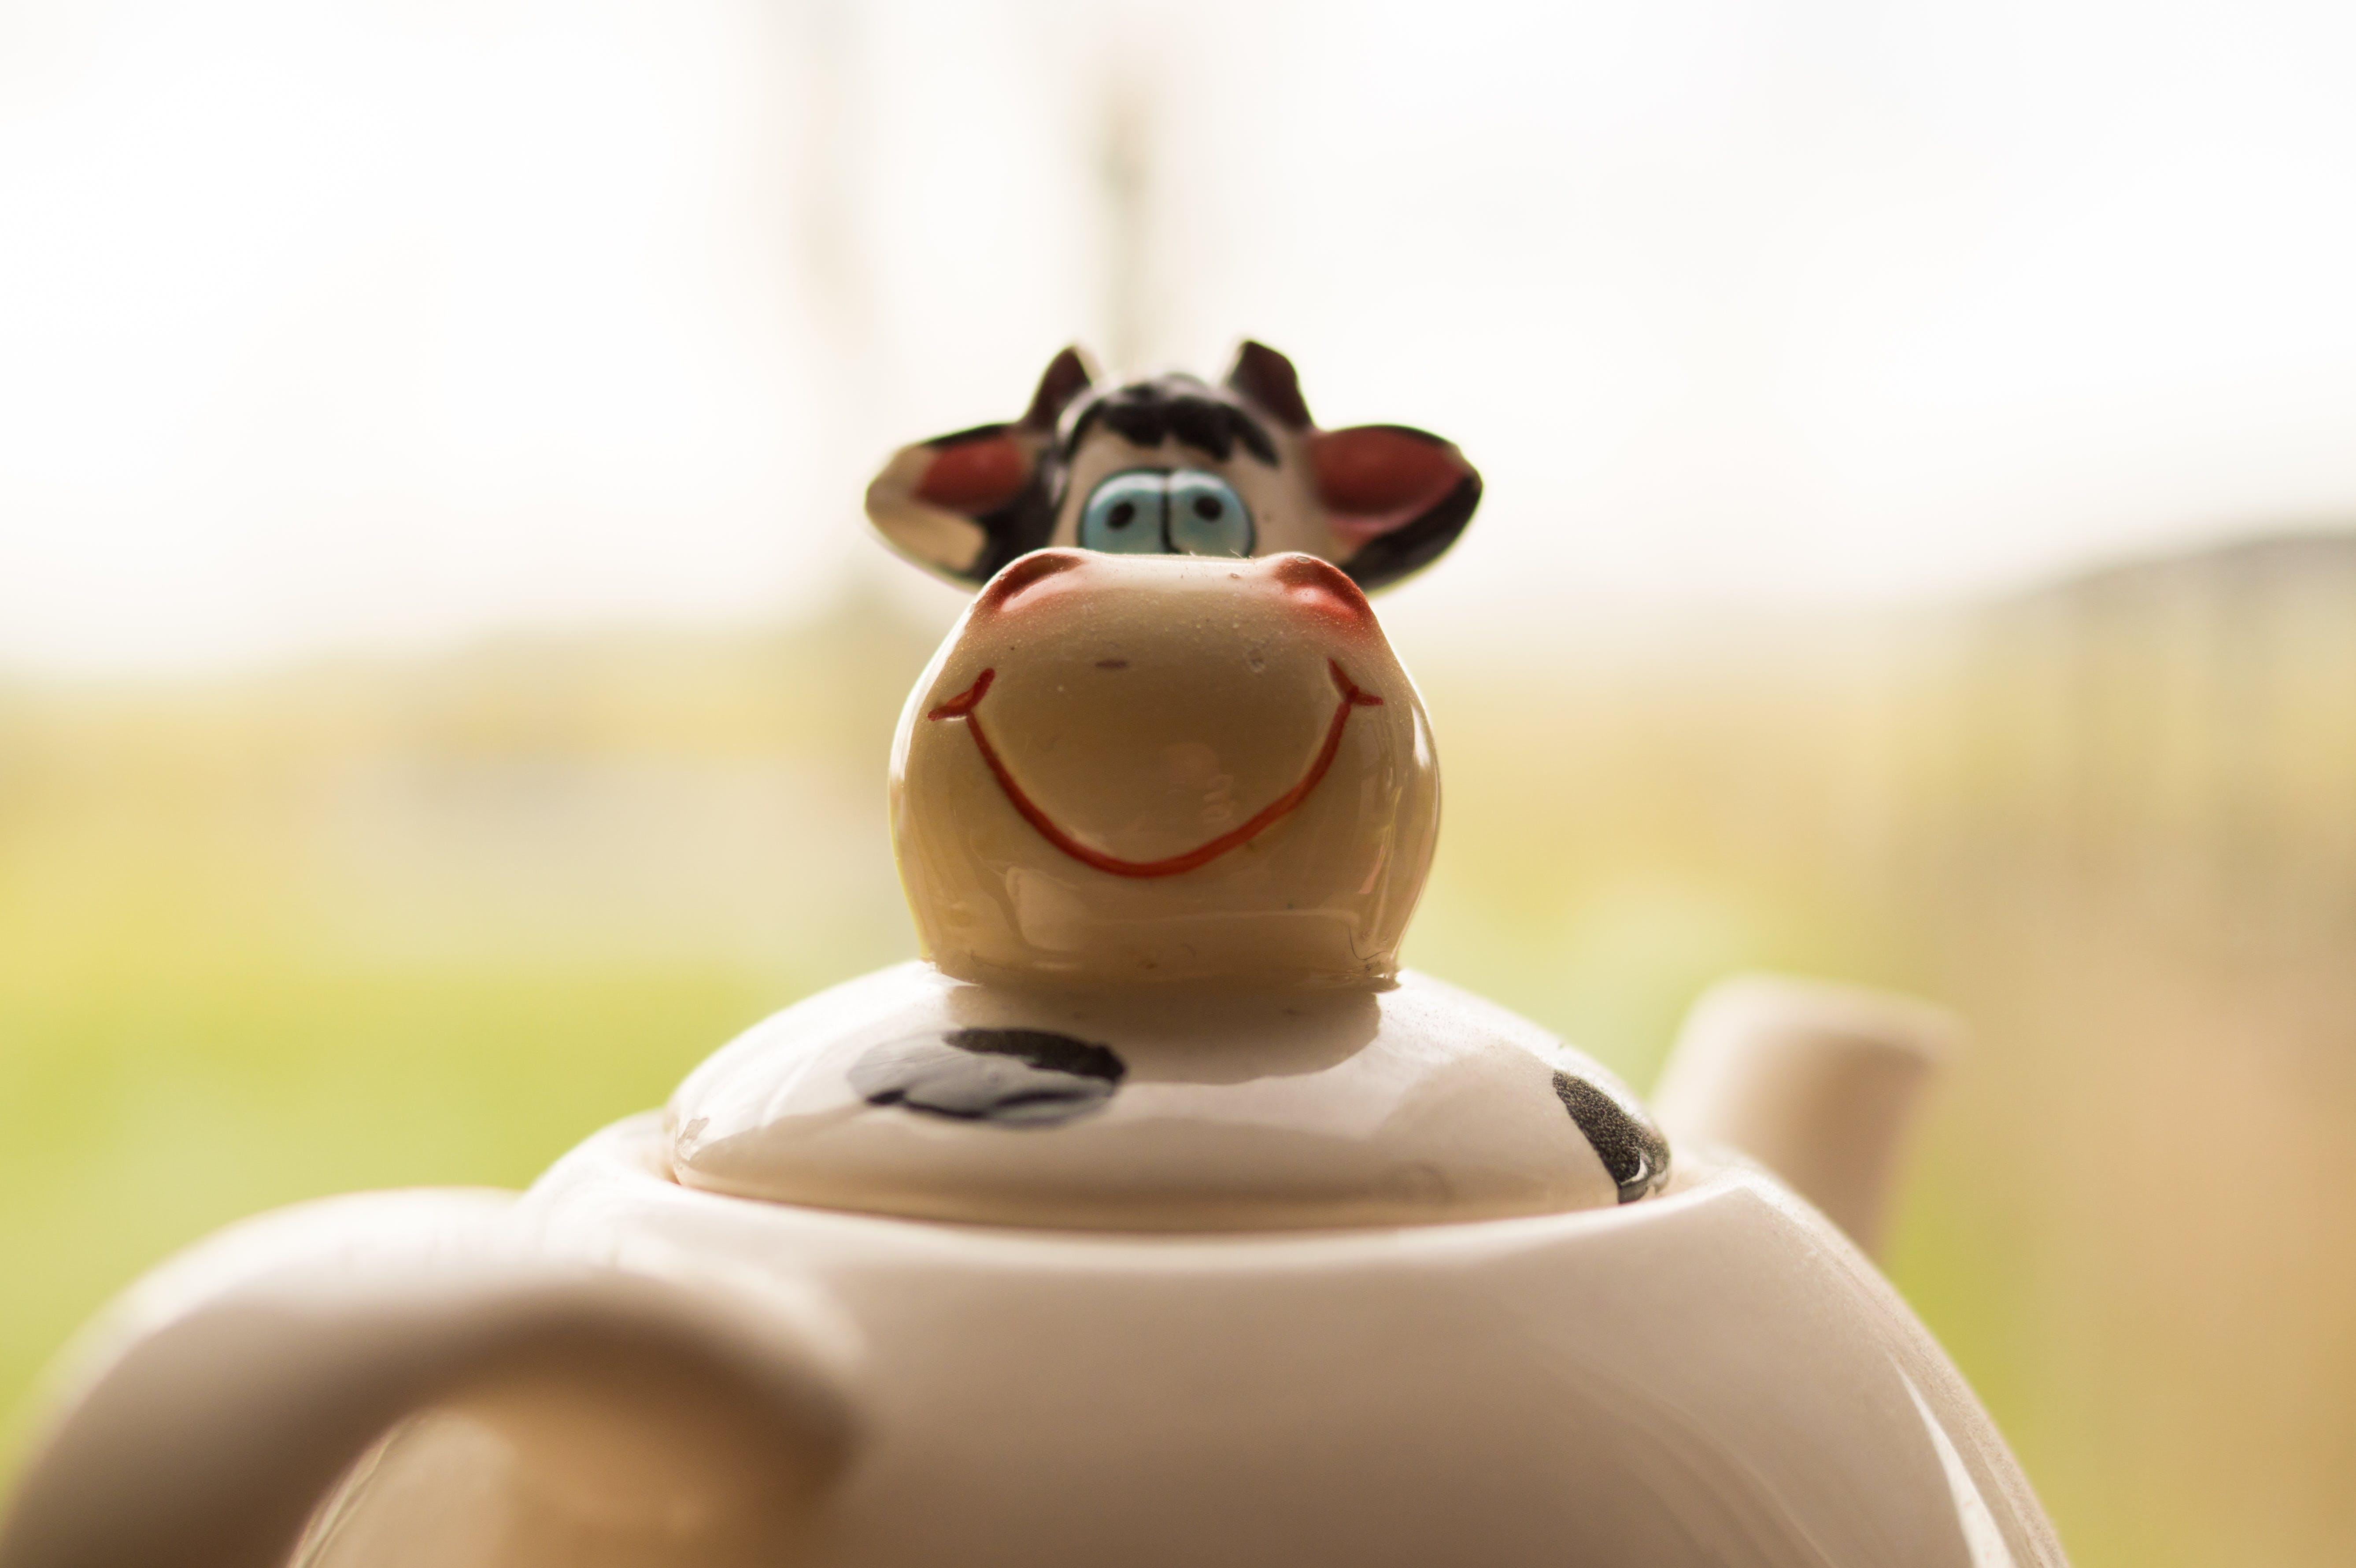 White and Black Ceramic Cattle Teapot Photo